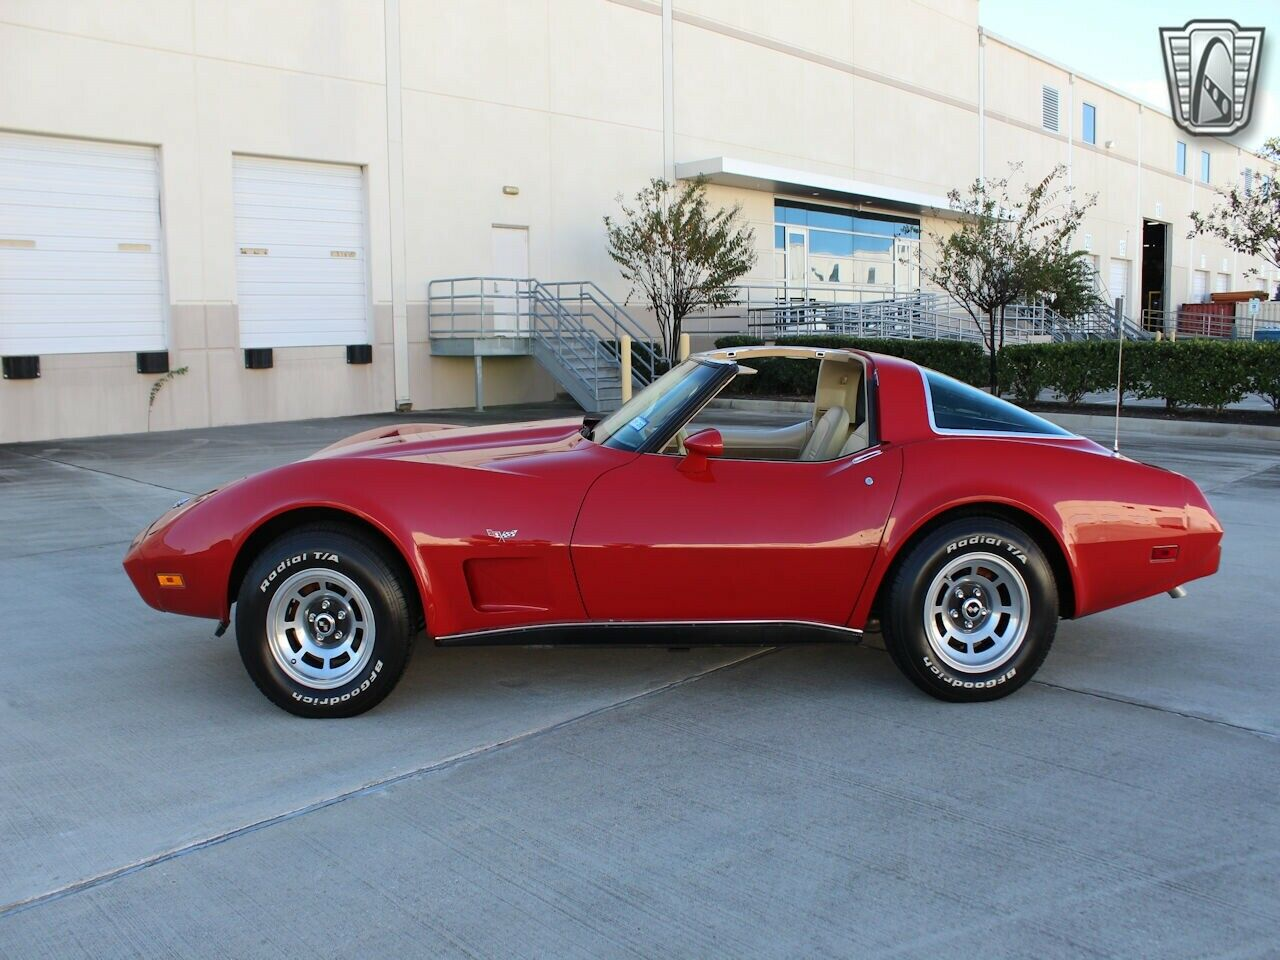 1978 Red Chevrolet Corvette   | C3 Corvette Photo 3